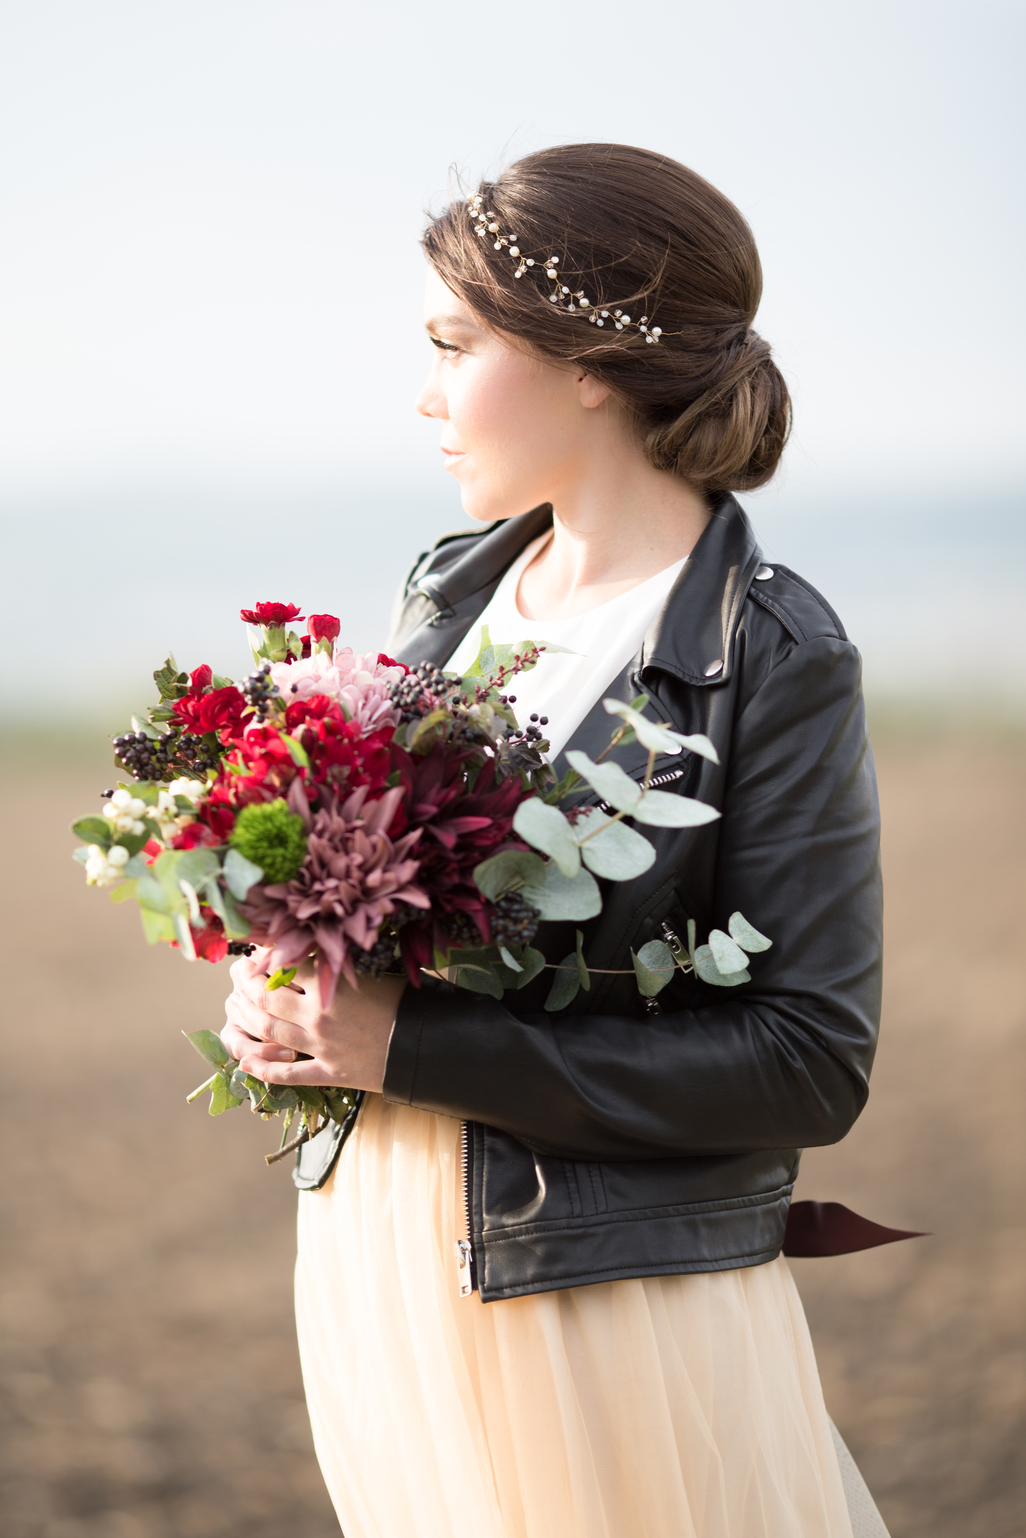 Katharina Edinger, Hochzeitsinspiration Shooting